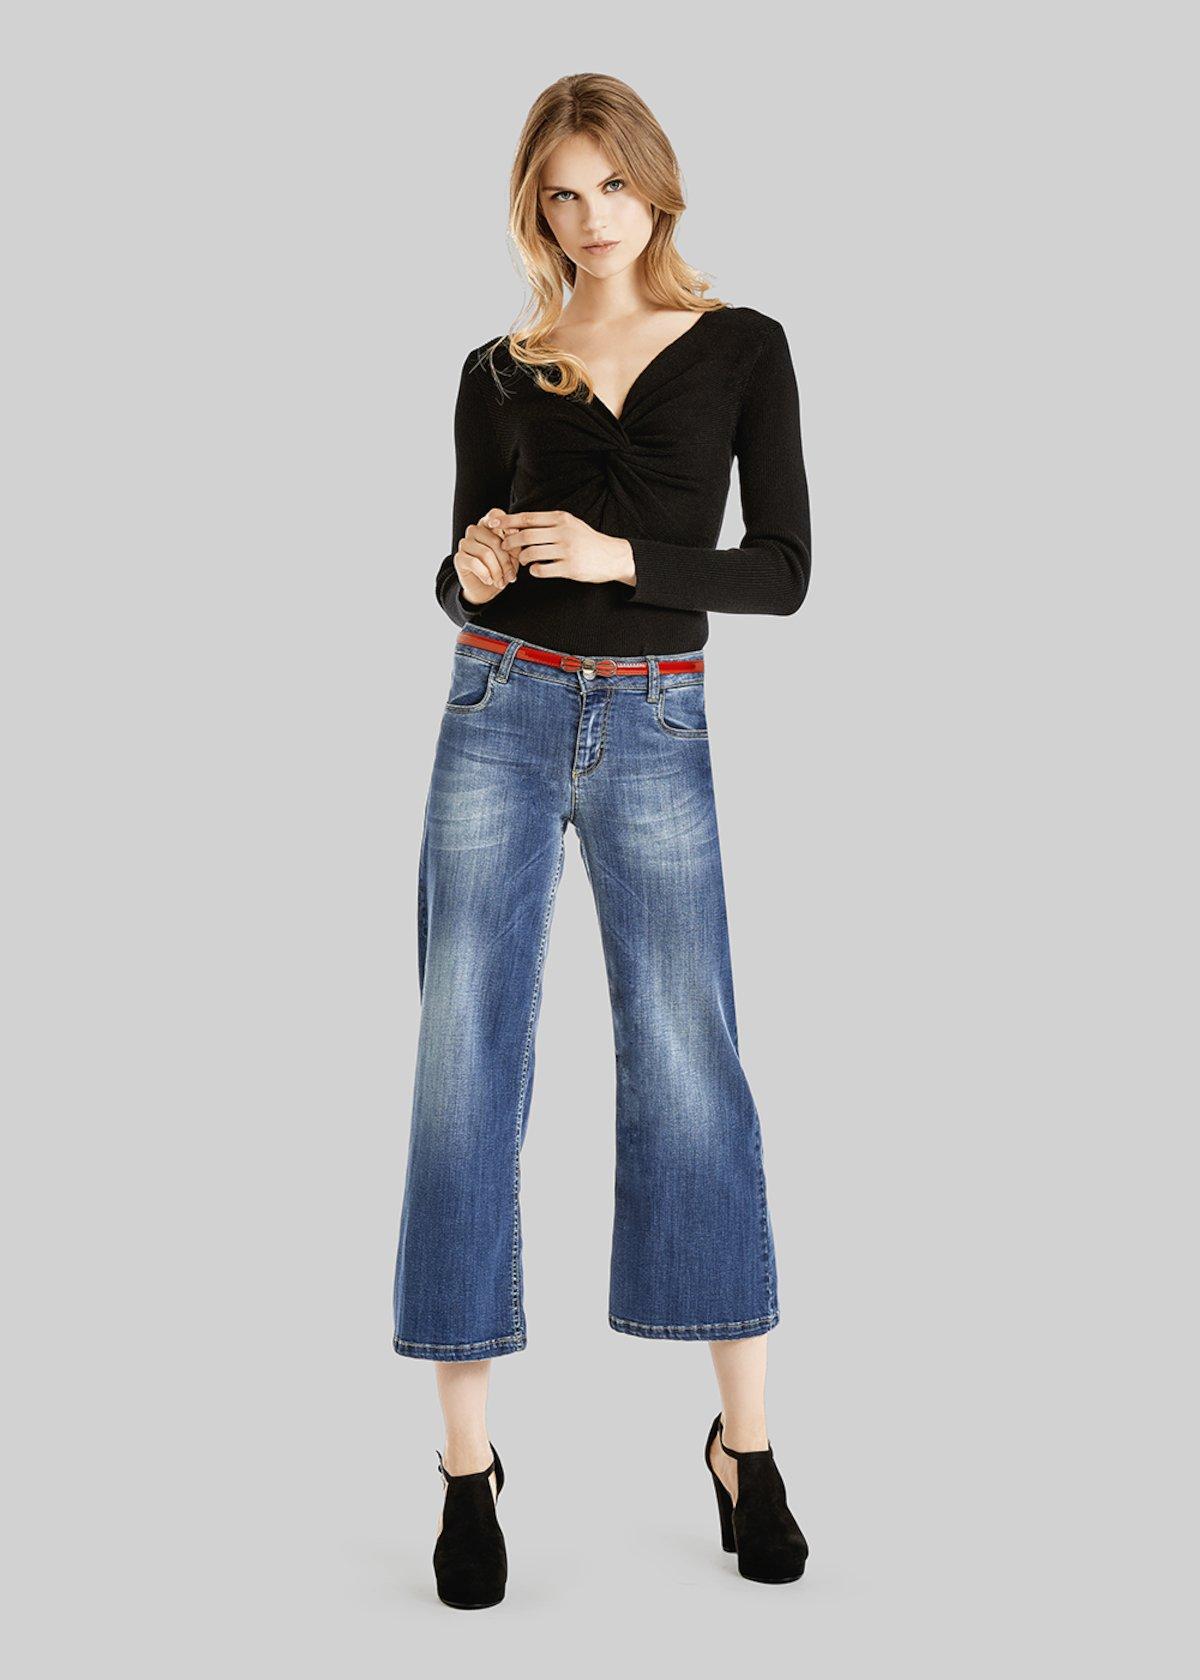 Dylan denim palazzo short trousers - Medium Blue